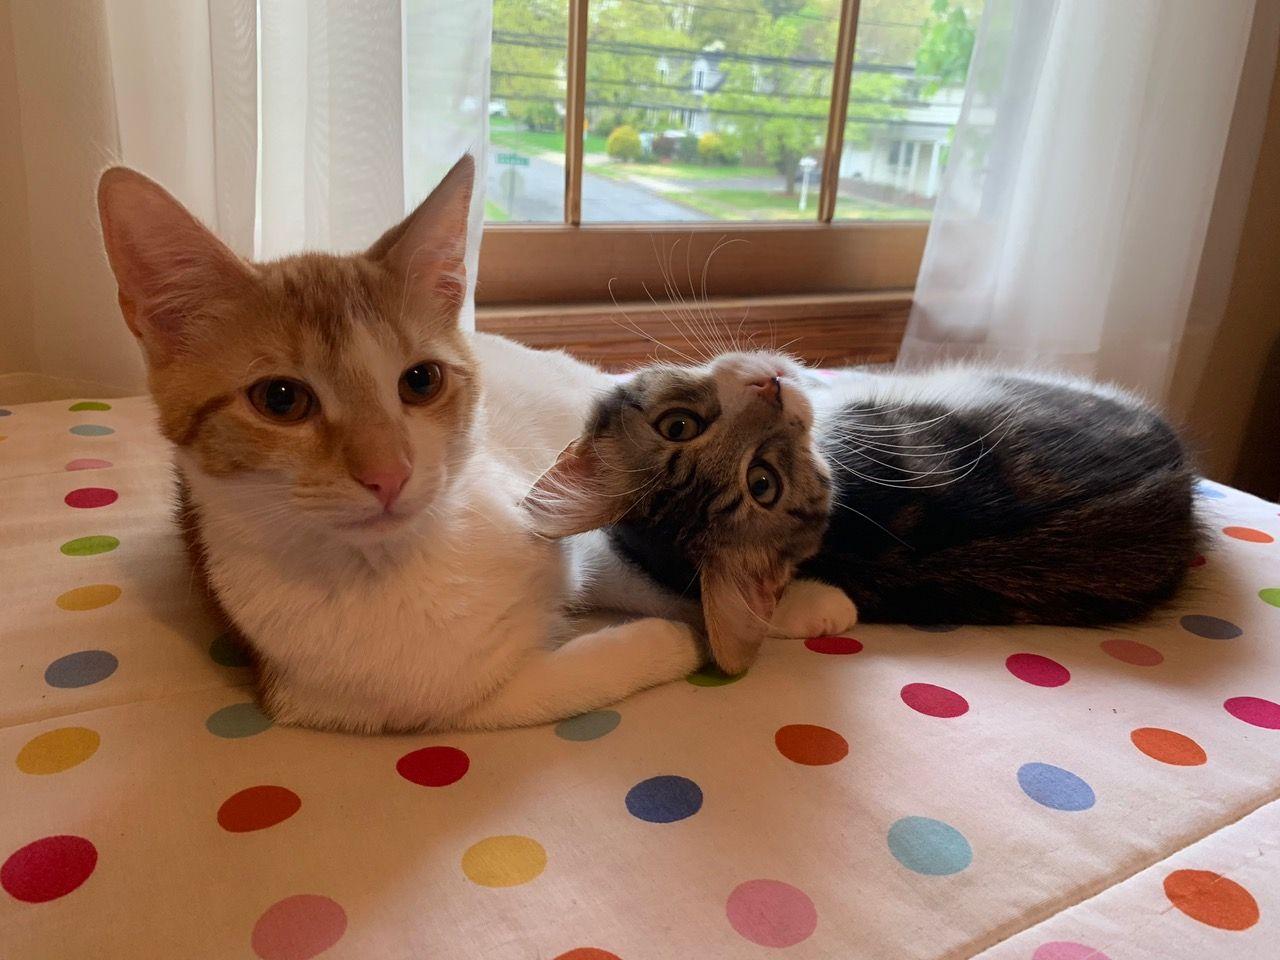 11/4/19: Skye & Buddy (aka Tigger)